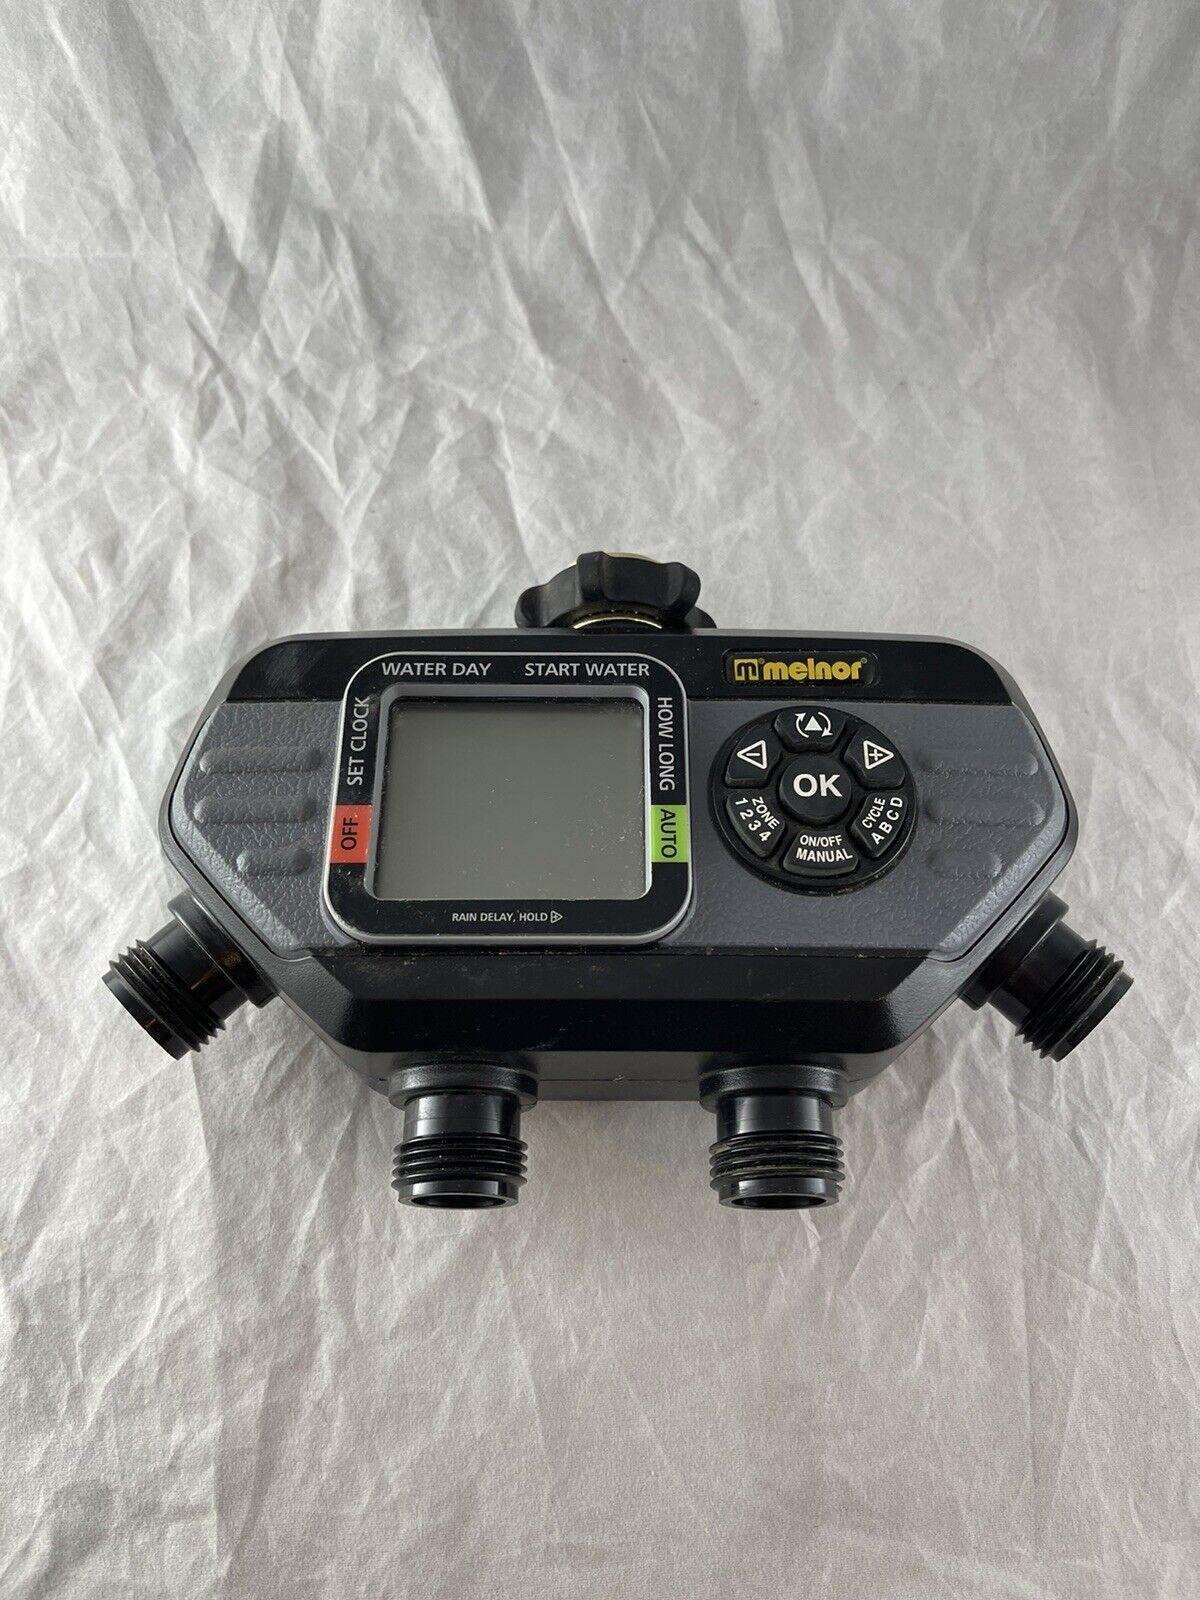 Melnor 73280 Black/Gray Digital Water Electronic 4-Zone Hose Timer